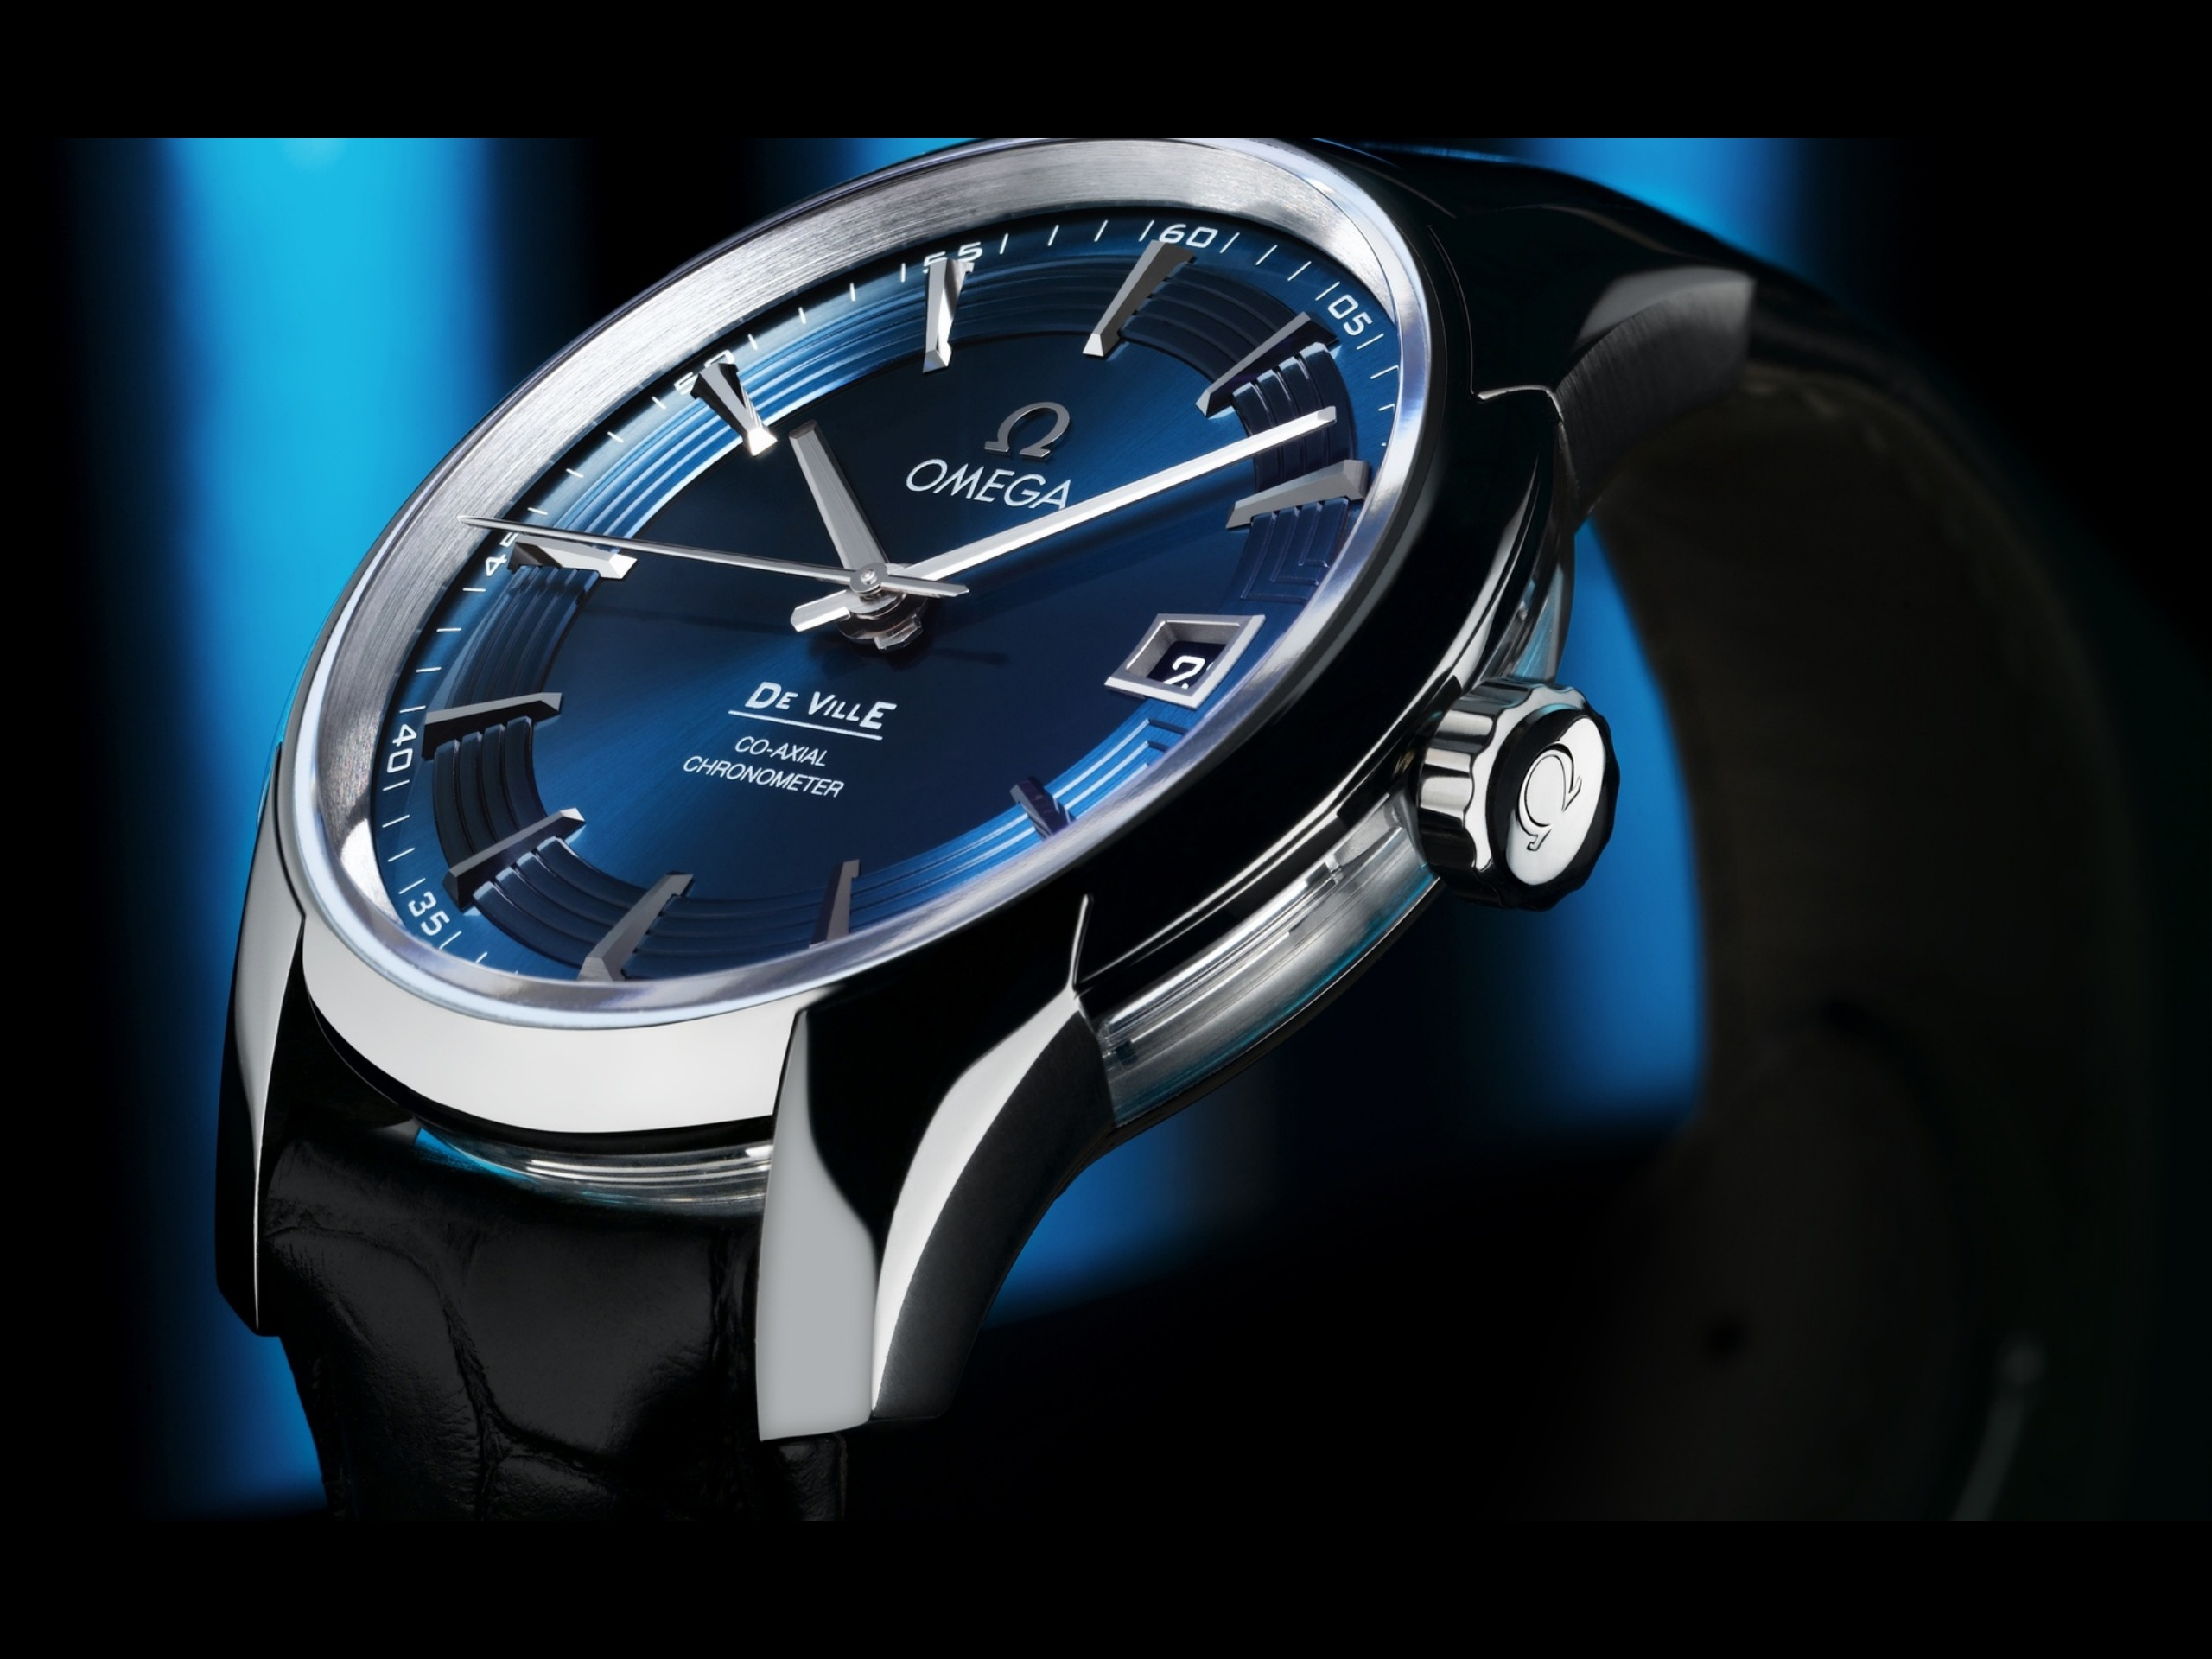 2560x1920 Omega Watch desktop wallpapers and stock photos 2560x1920